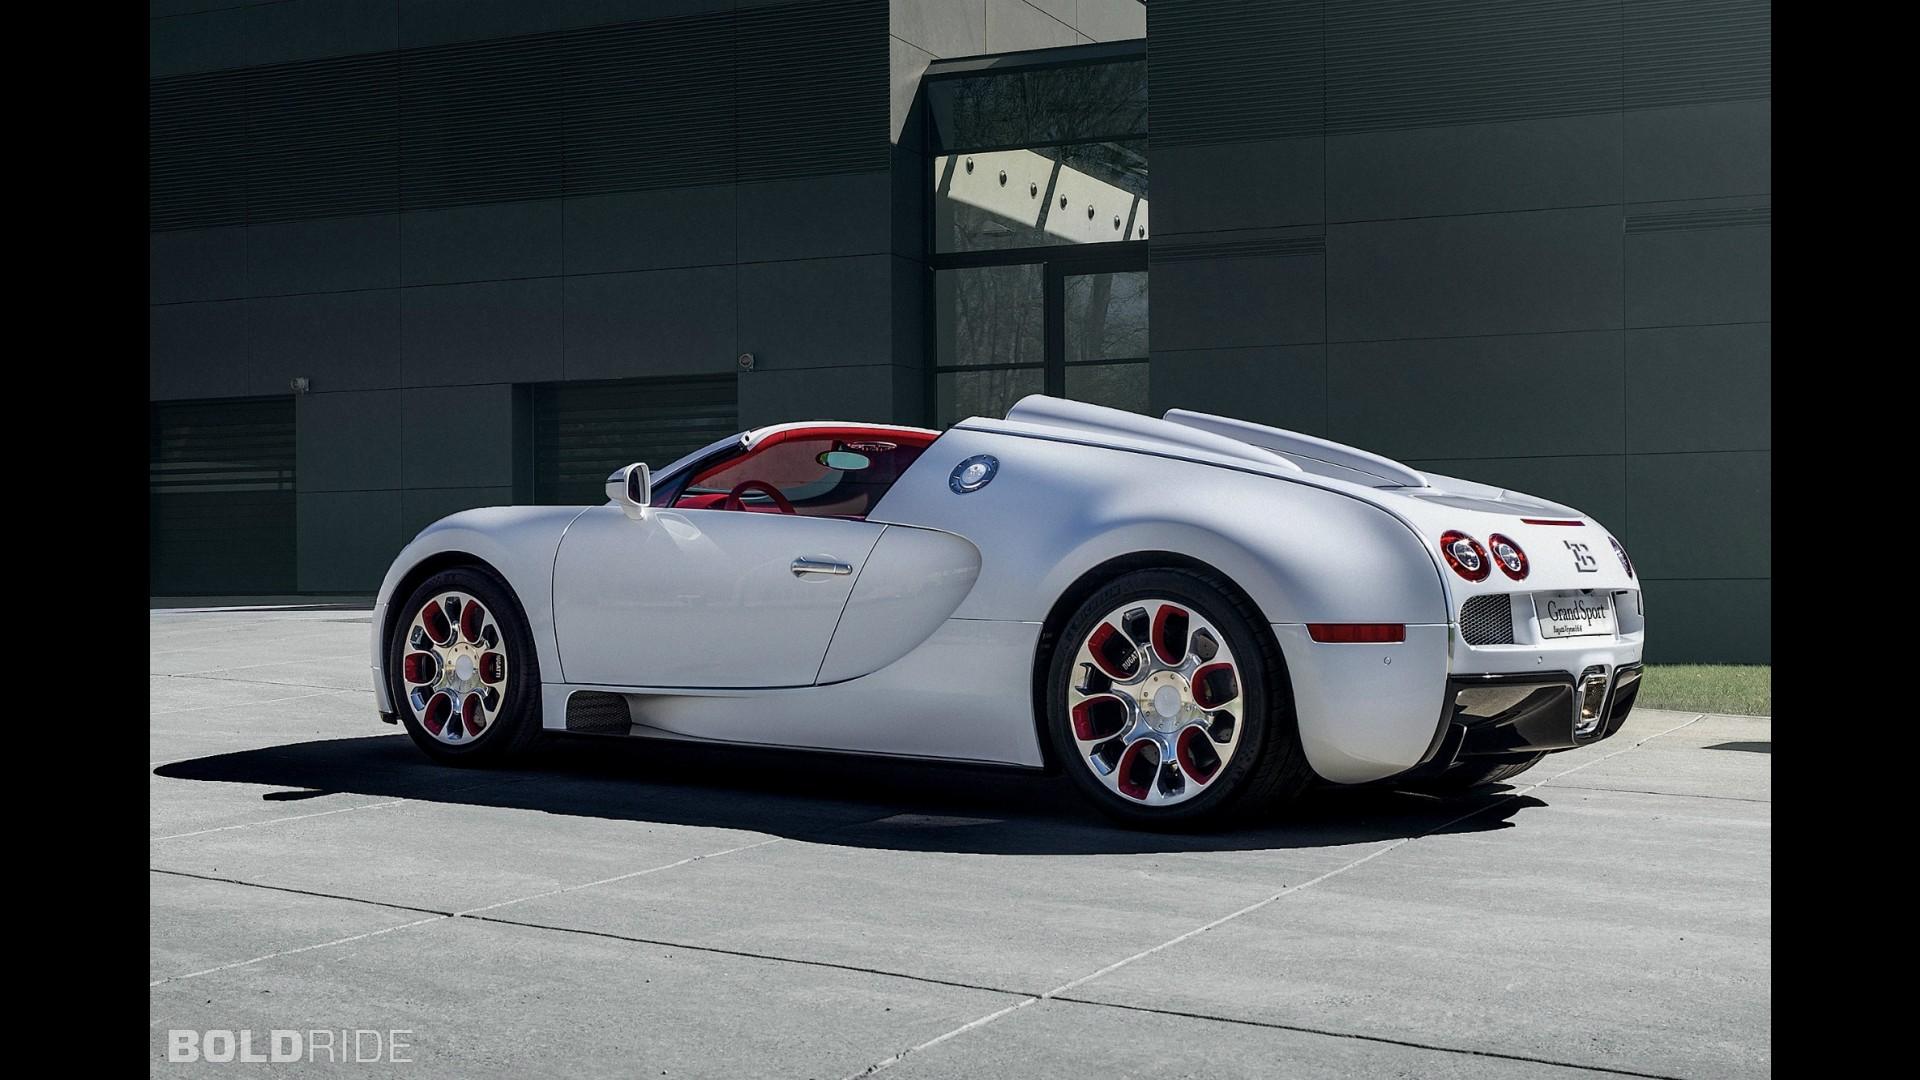 bugatti-veyron-grand-sport-wei-long Fascinating Bugatti Veyron Grand Sport Vitesse Convertible Cars Trend